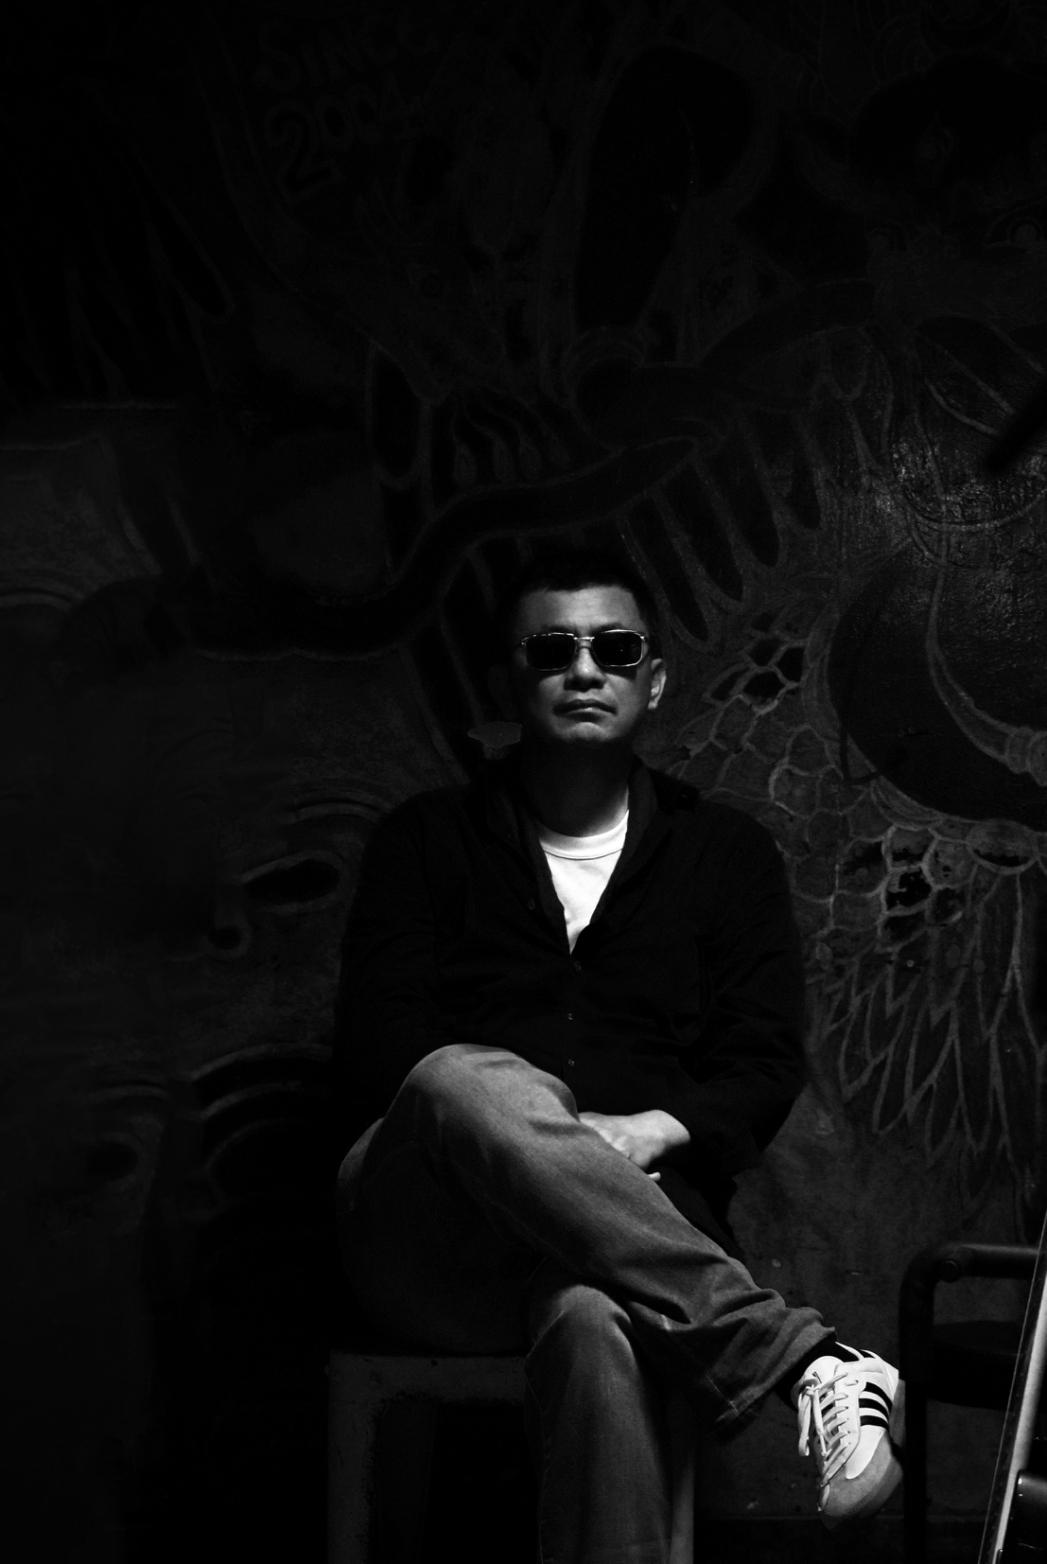 Wong Kar Wai's Portrait - ©️Jettone Films 澤東電影 - 1